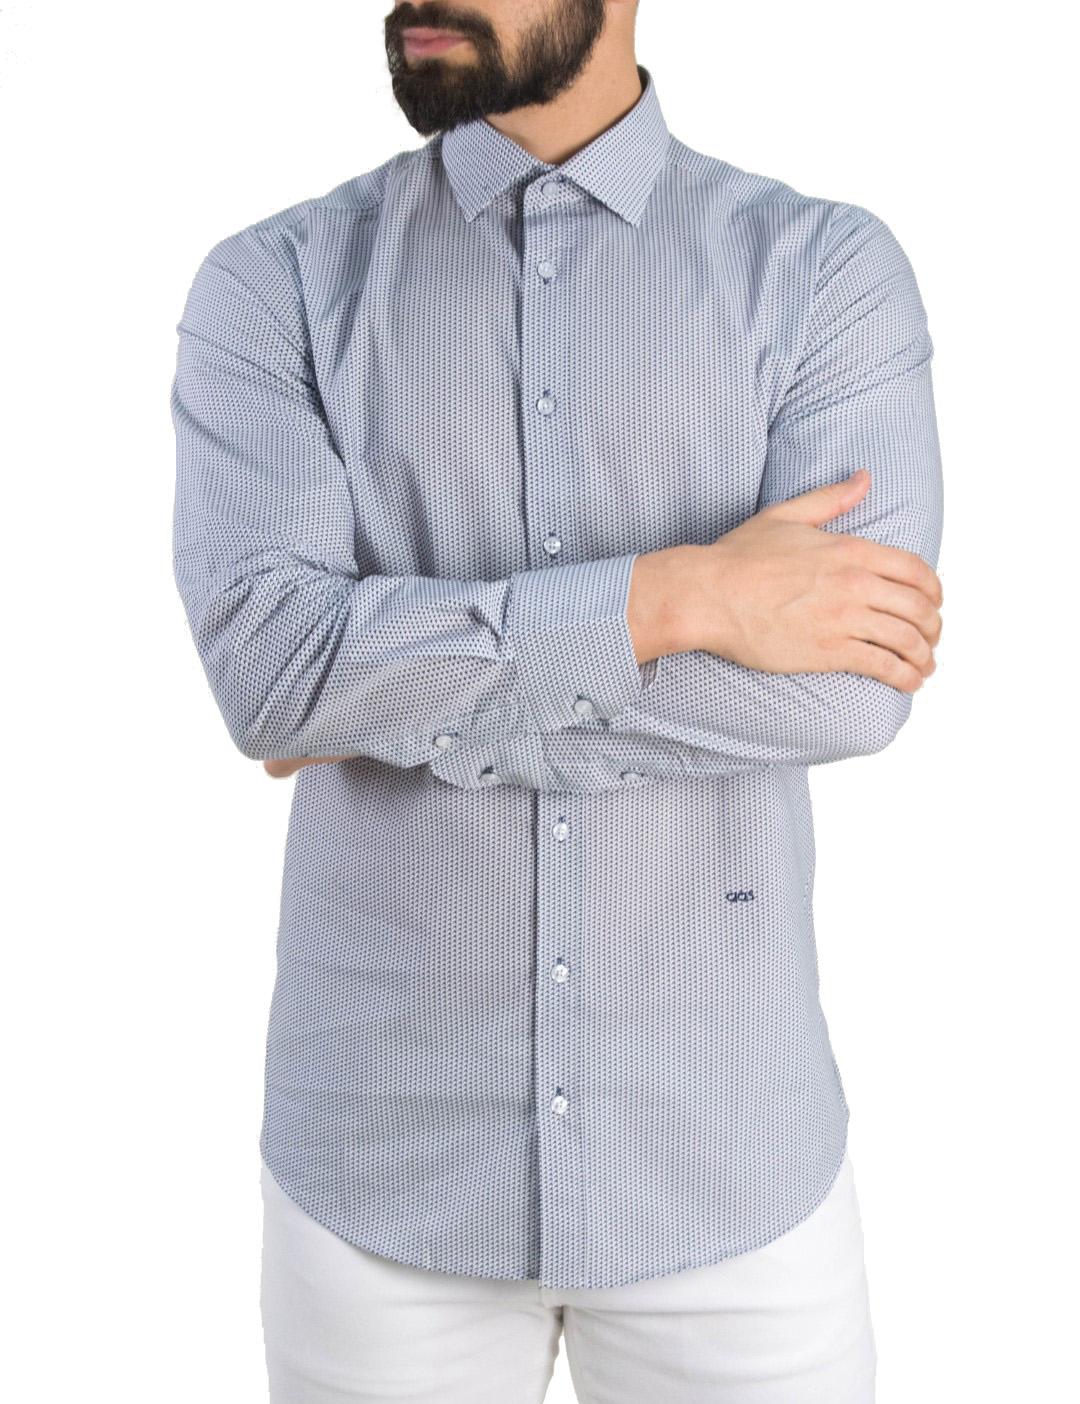 6216751c110e Gio.S Ανδρικό λευκό πουκάμισο μικροσχέδιο GioS 9081S19 - Glami.gr